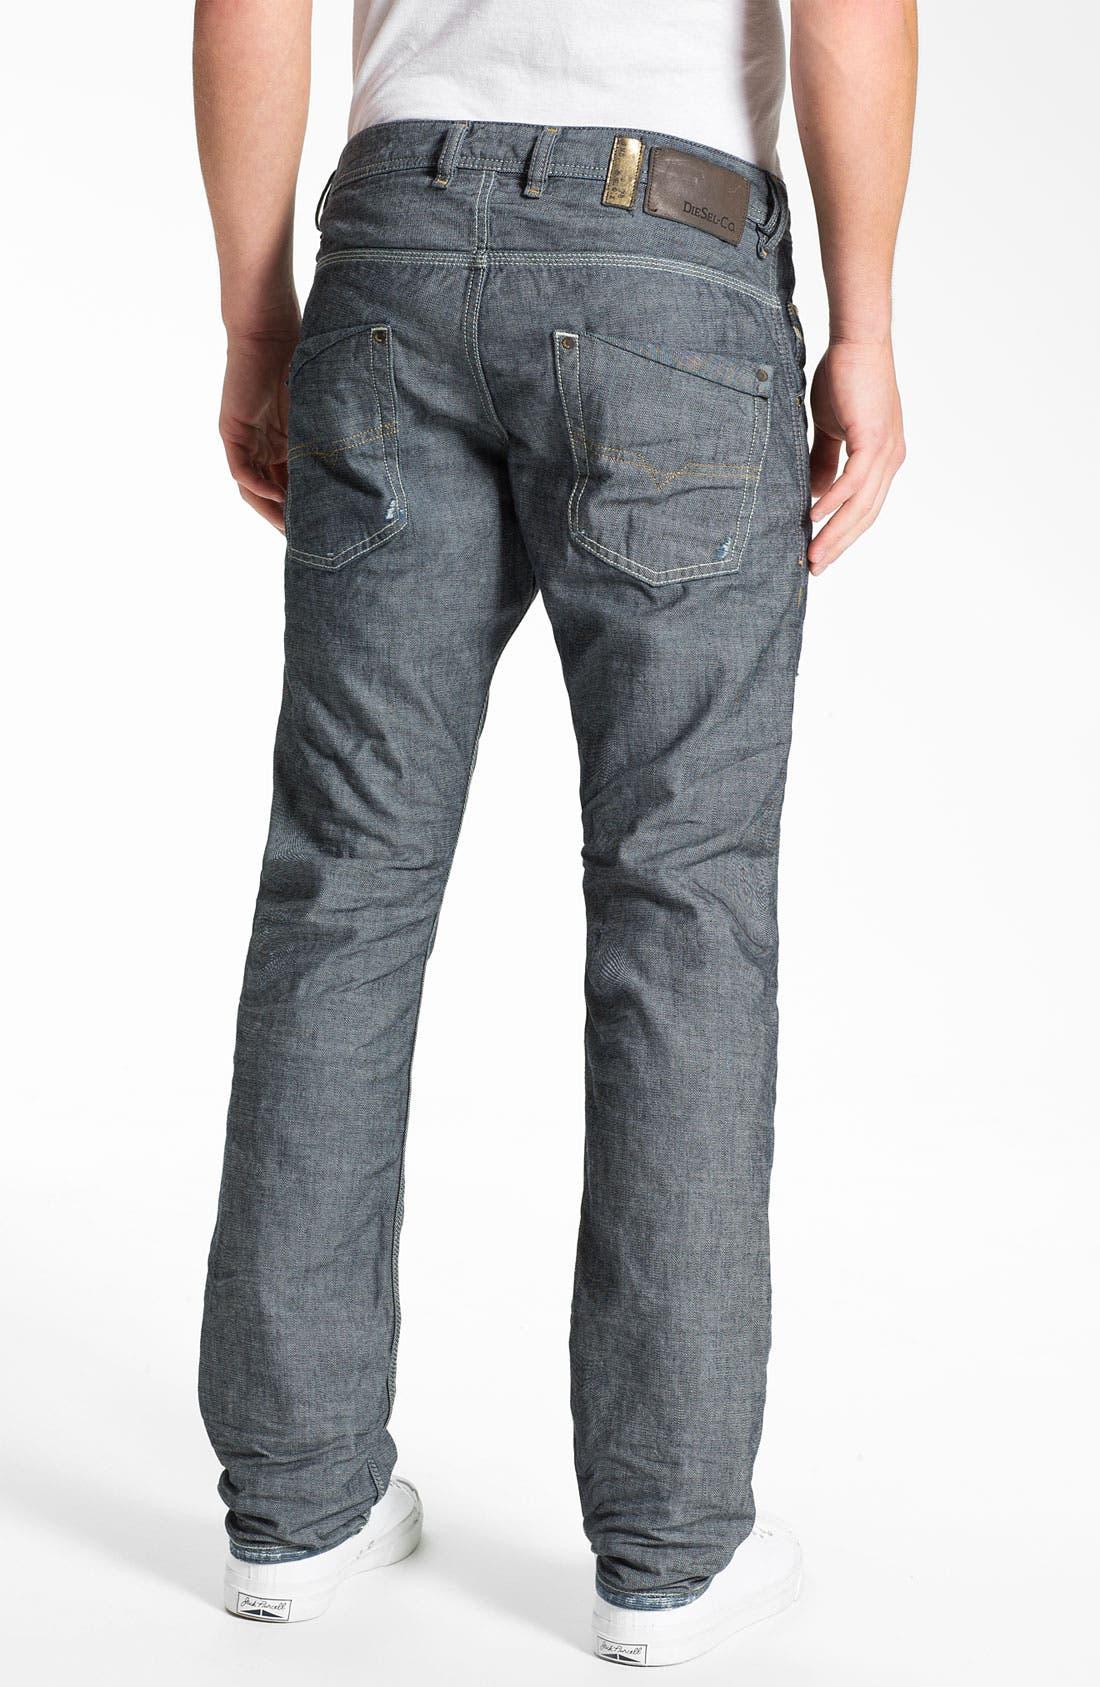 Alternate Image 1 Selected - DIESEL® 'Safado' Straight Leg Jeans (0809D)